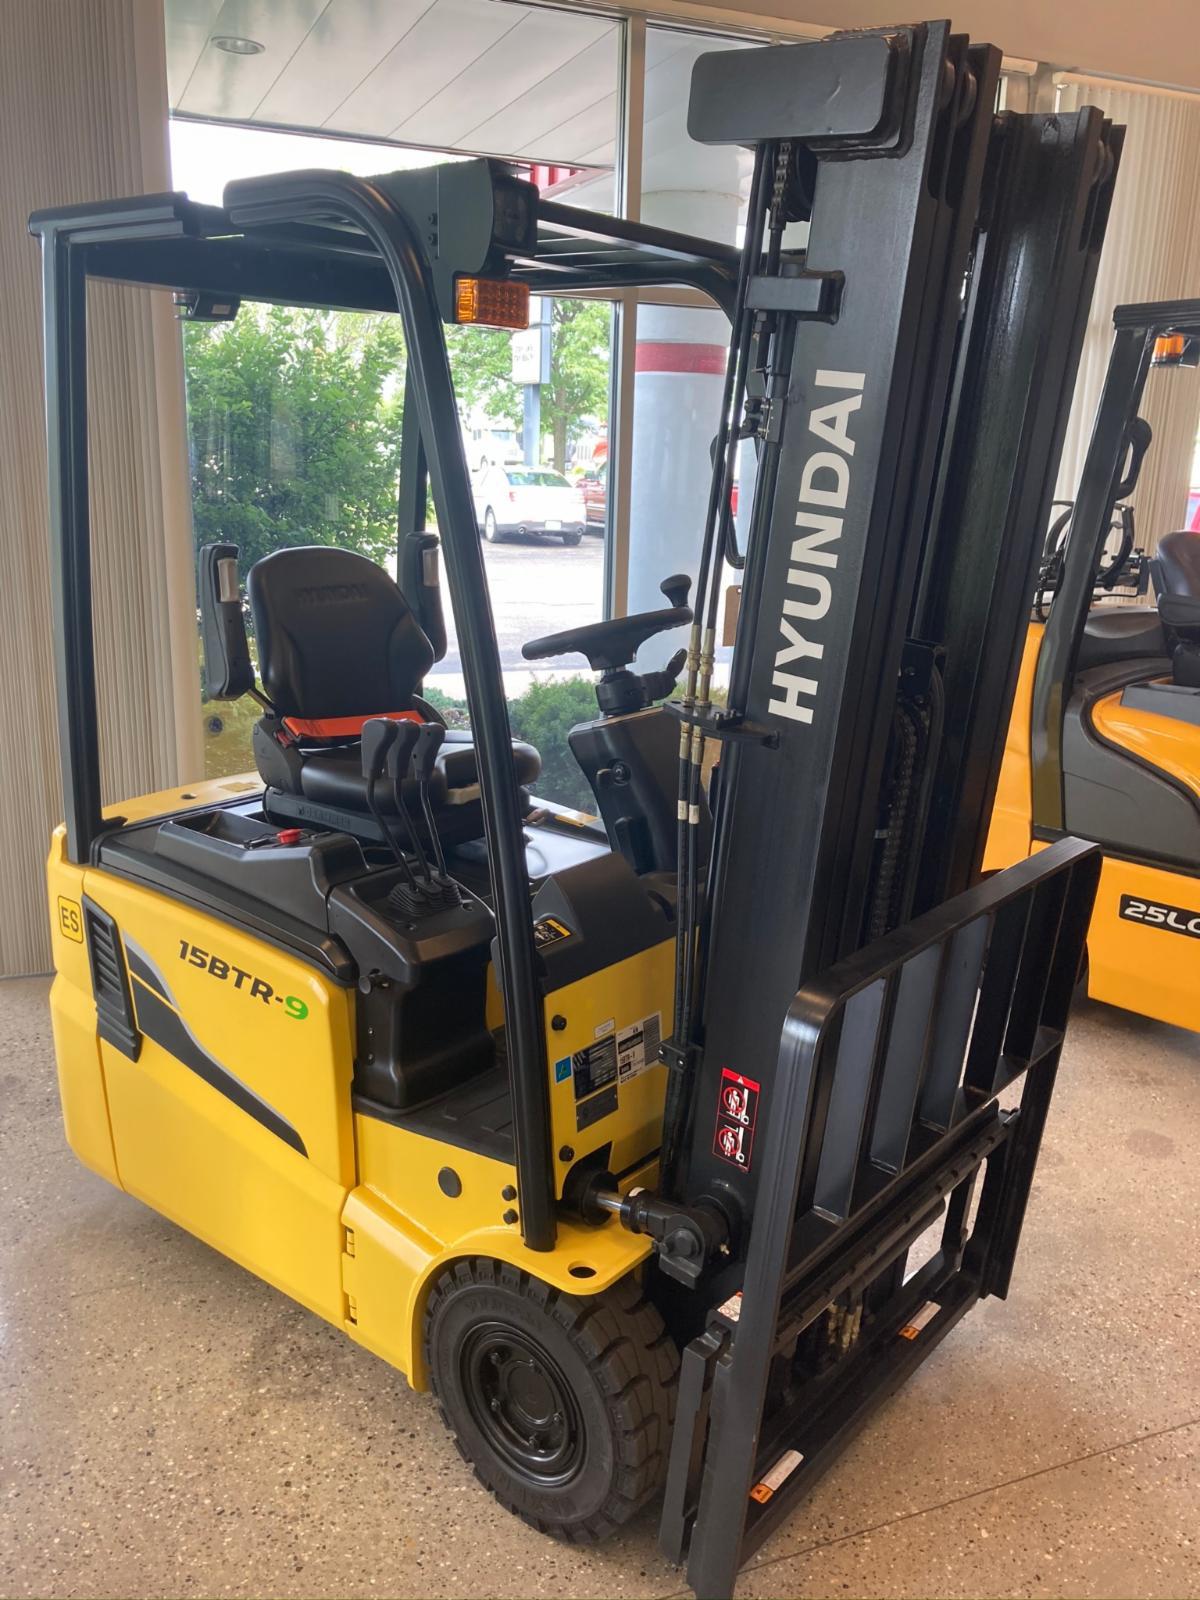 Hyundai 15BTR-9 Zero Turn Forklift